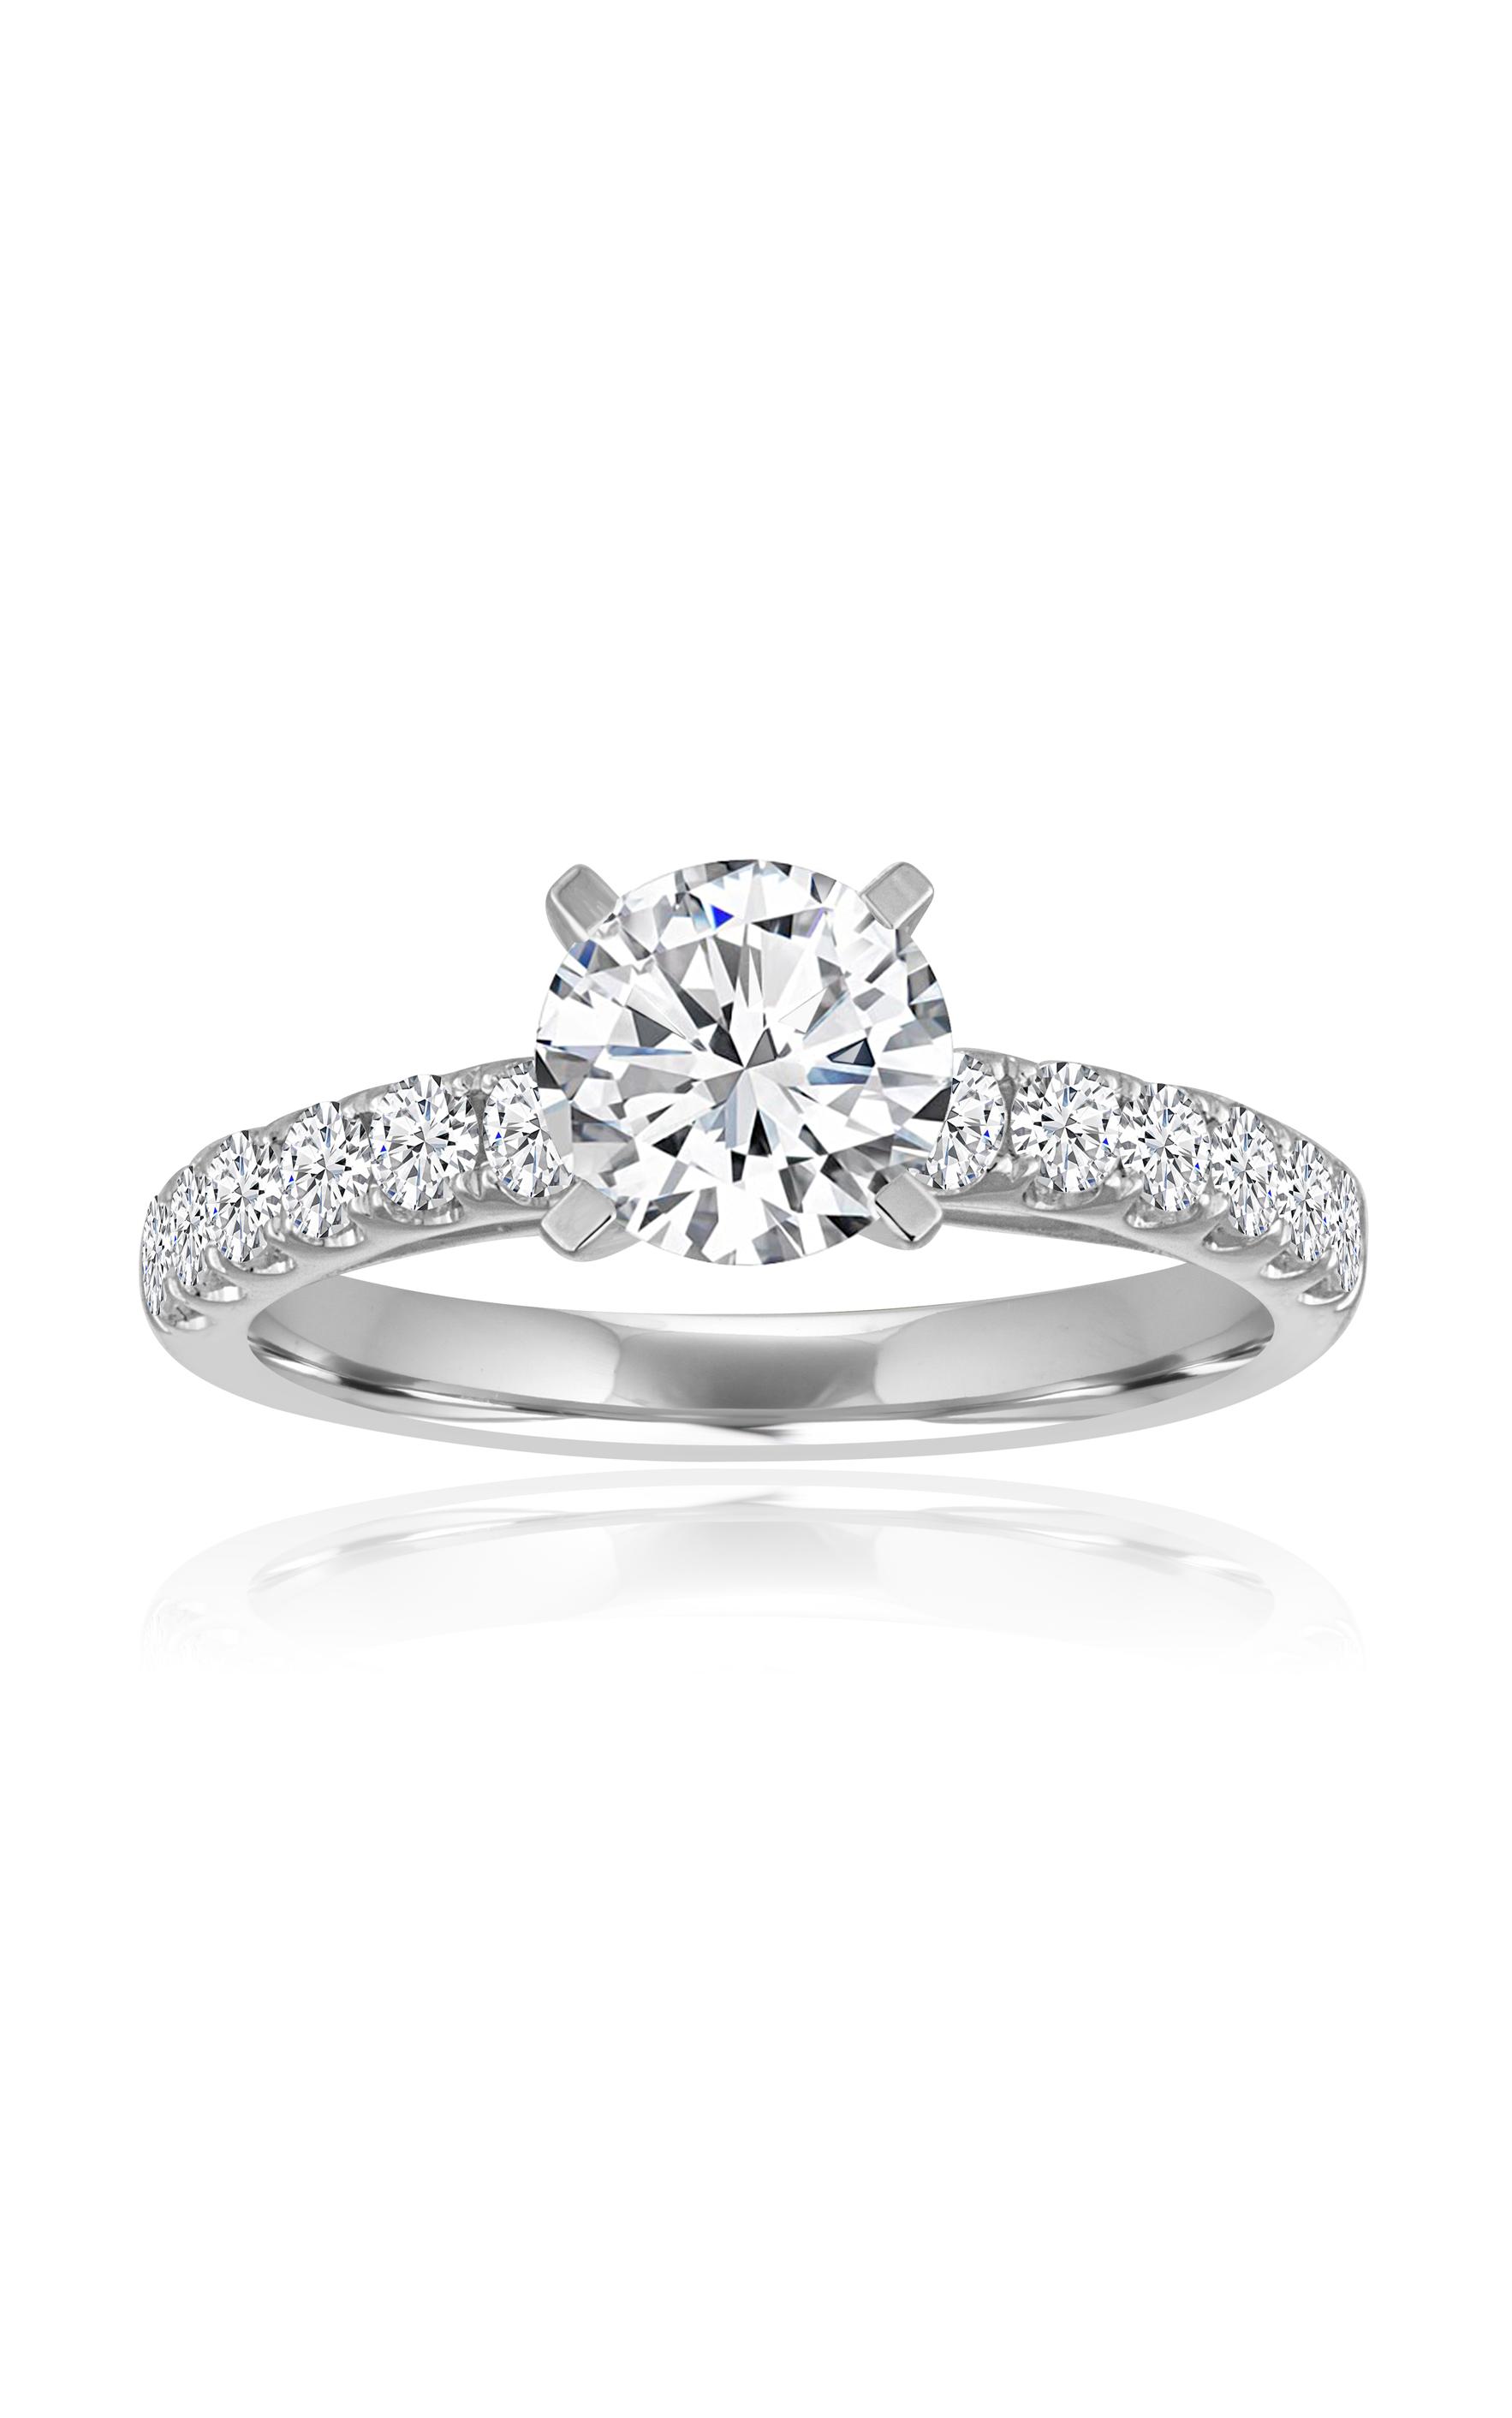 Imagine Bridal Engagement Rings 60156D-3 4 product image